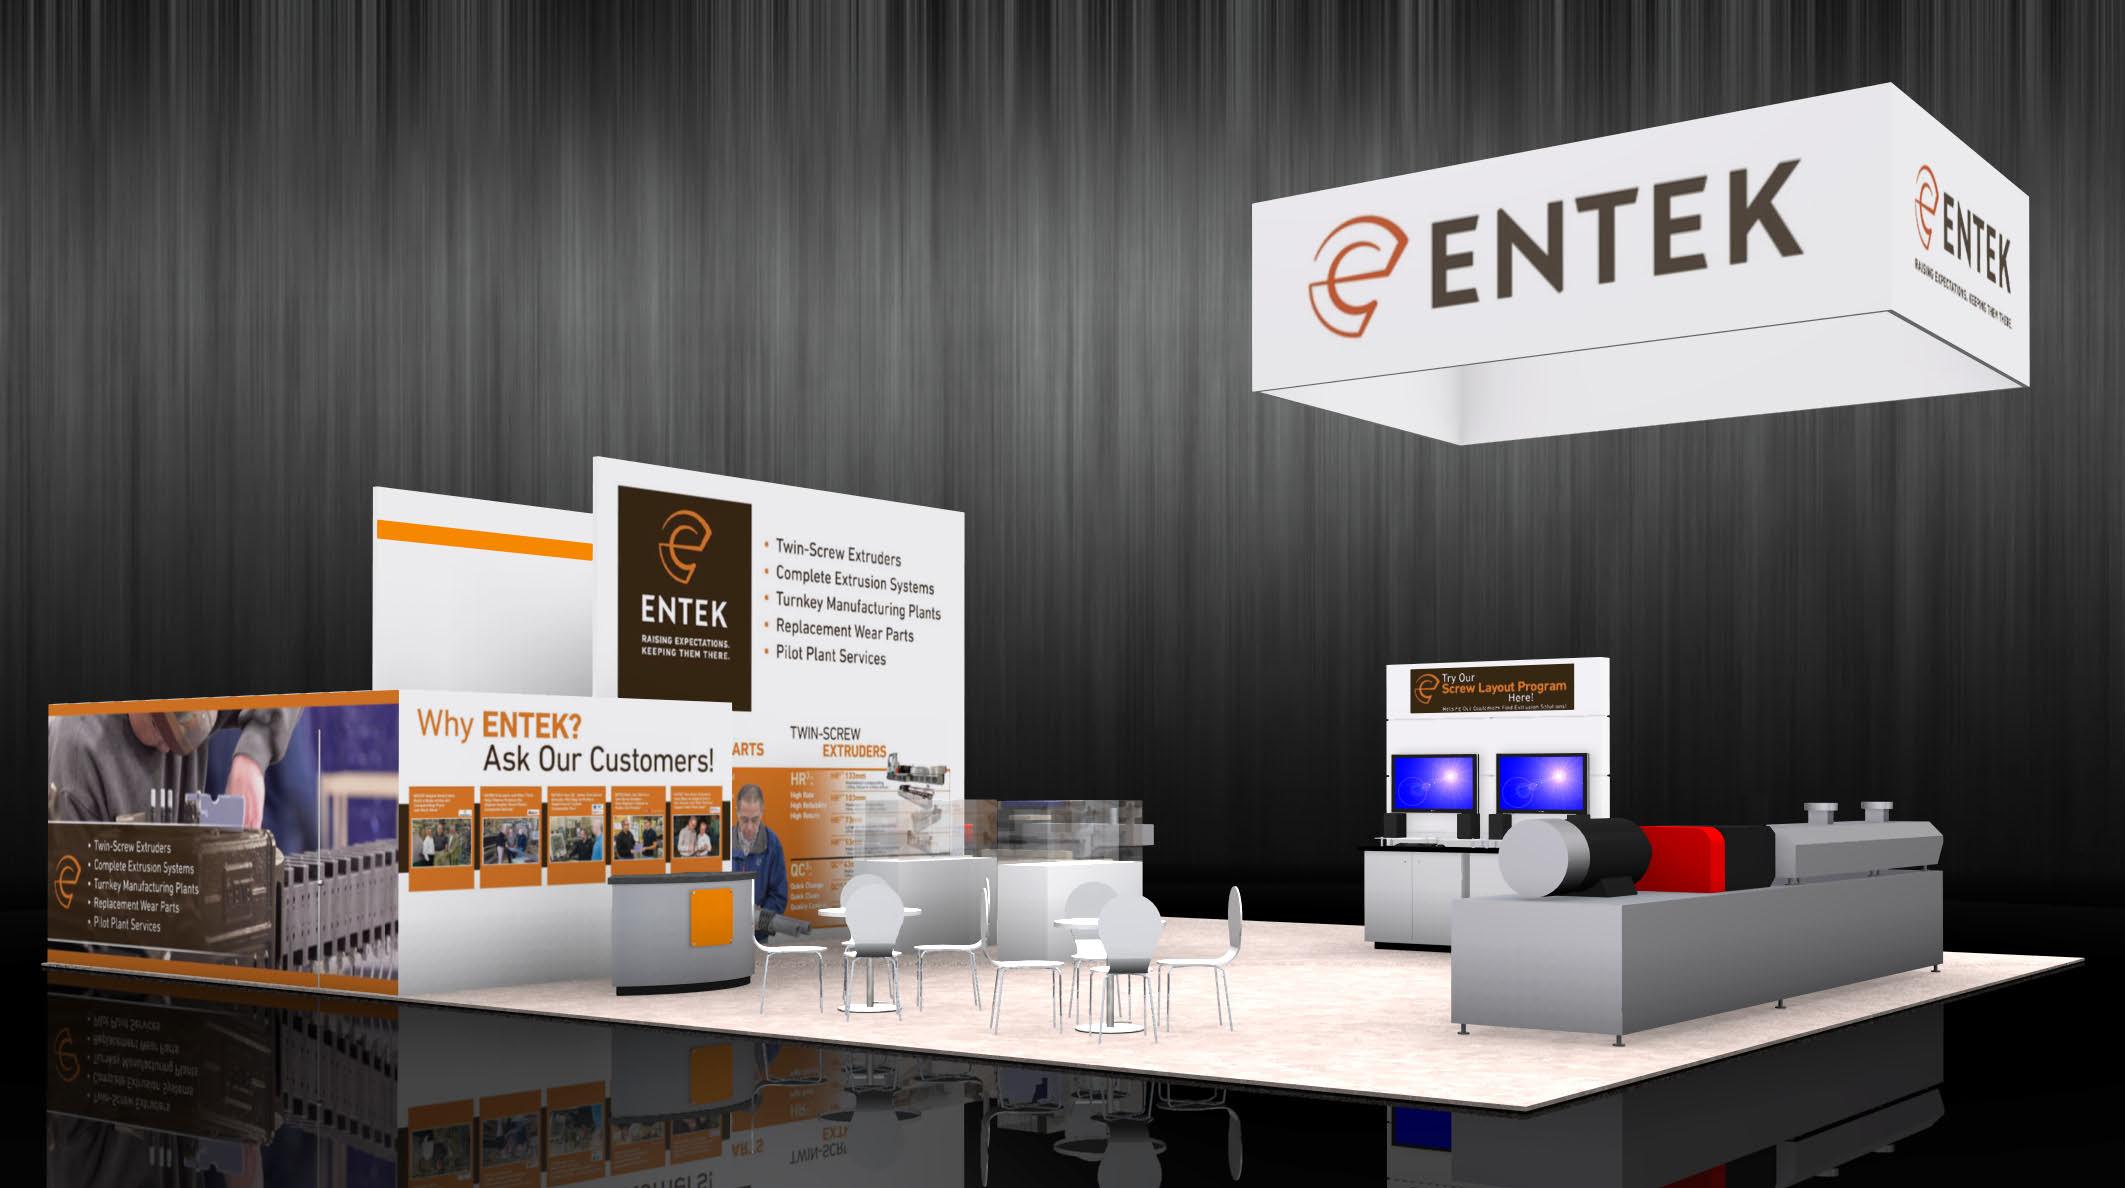 ENTEK 40 x 50 display - NPE 2018